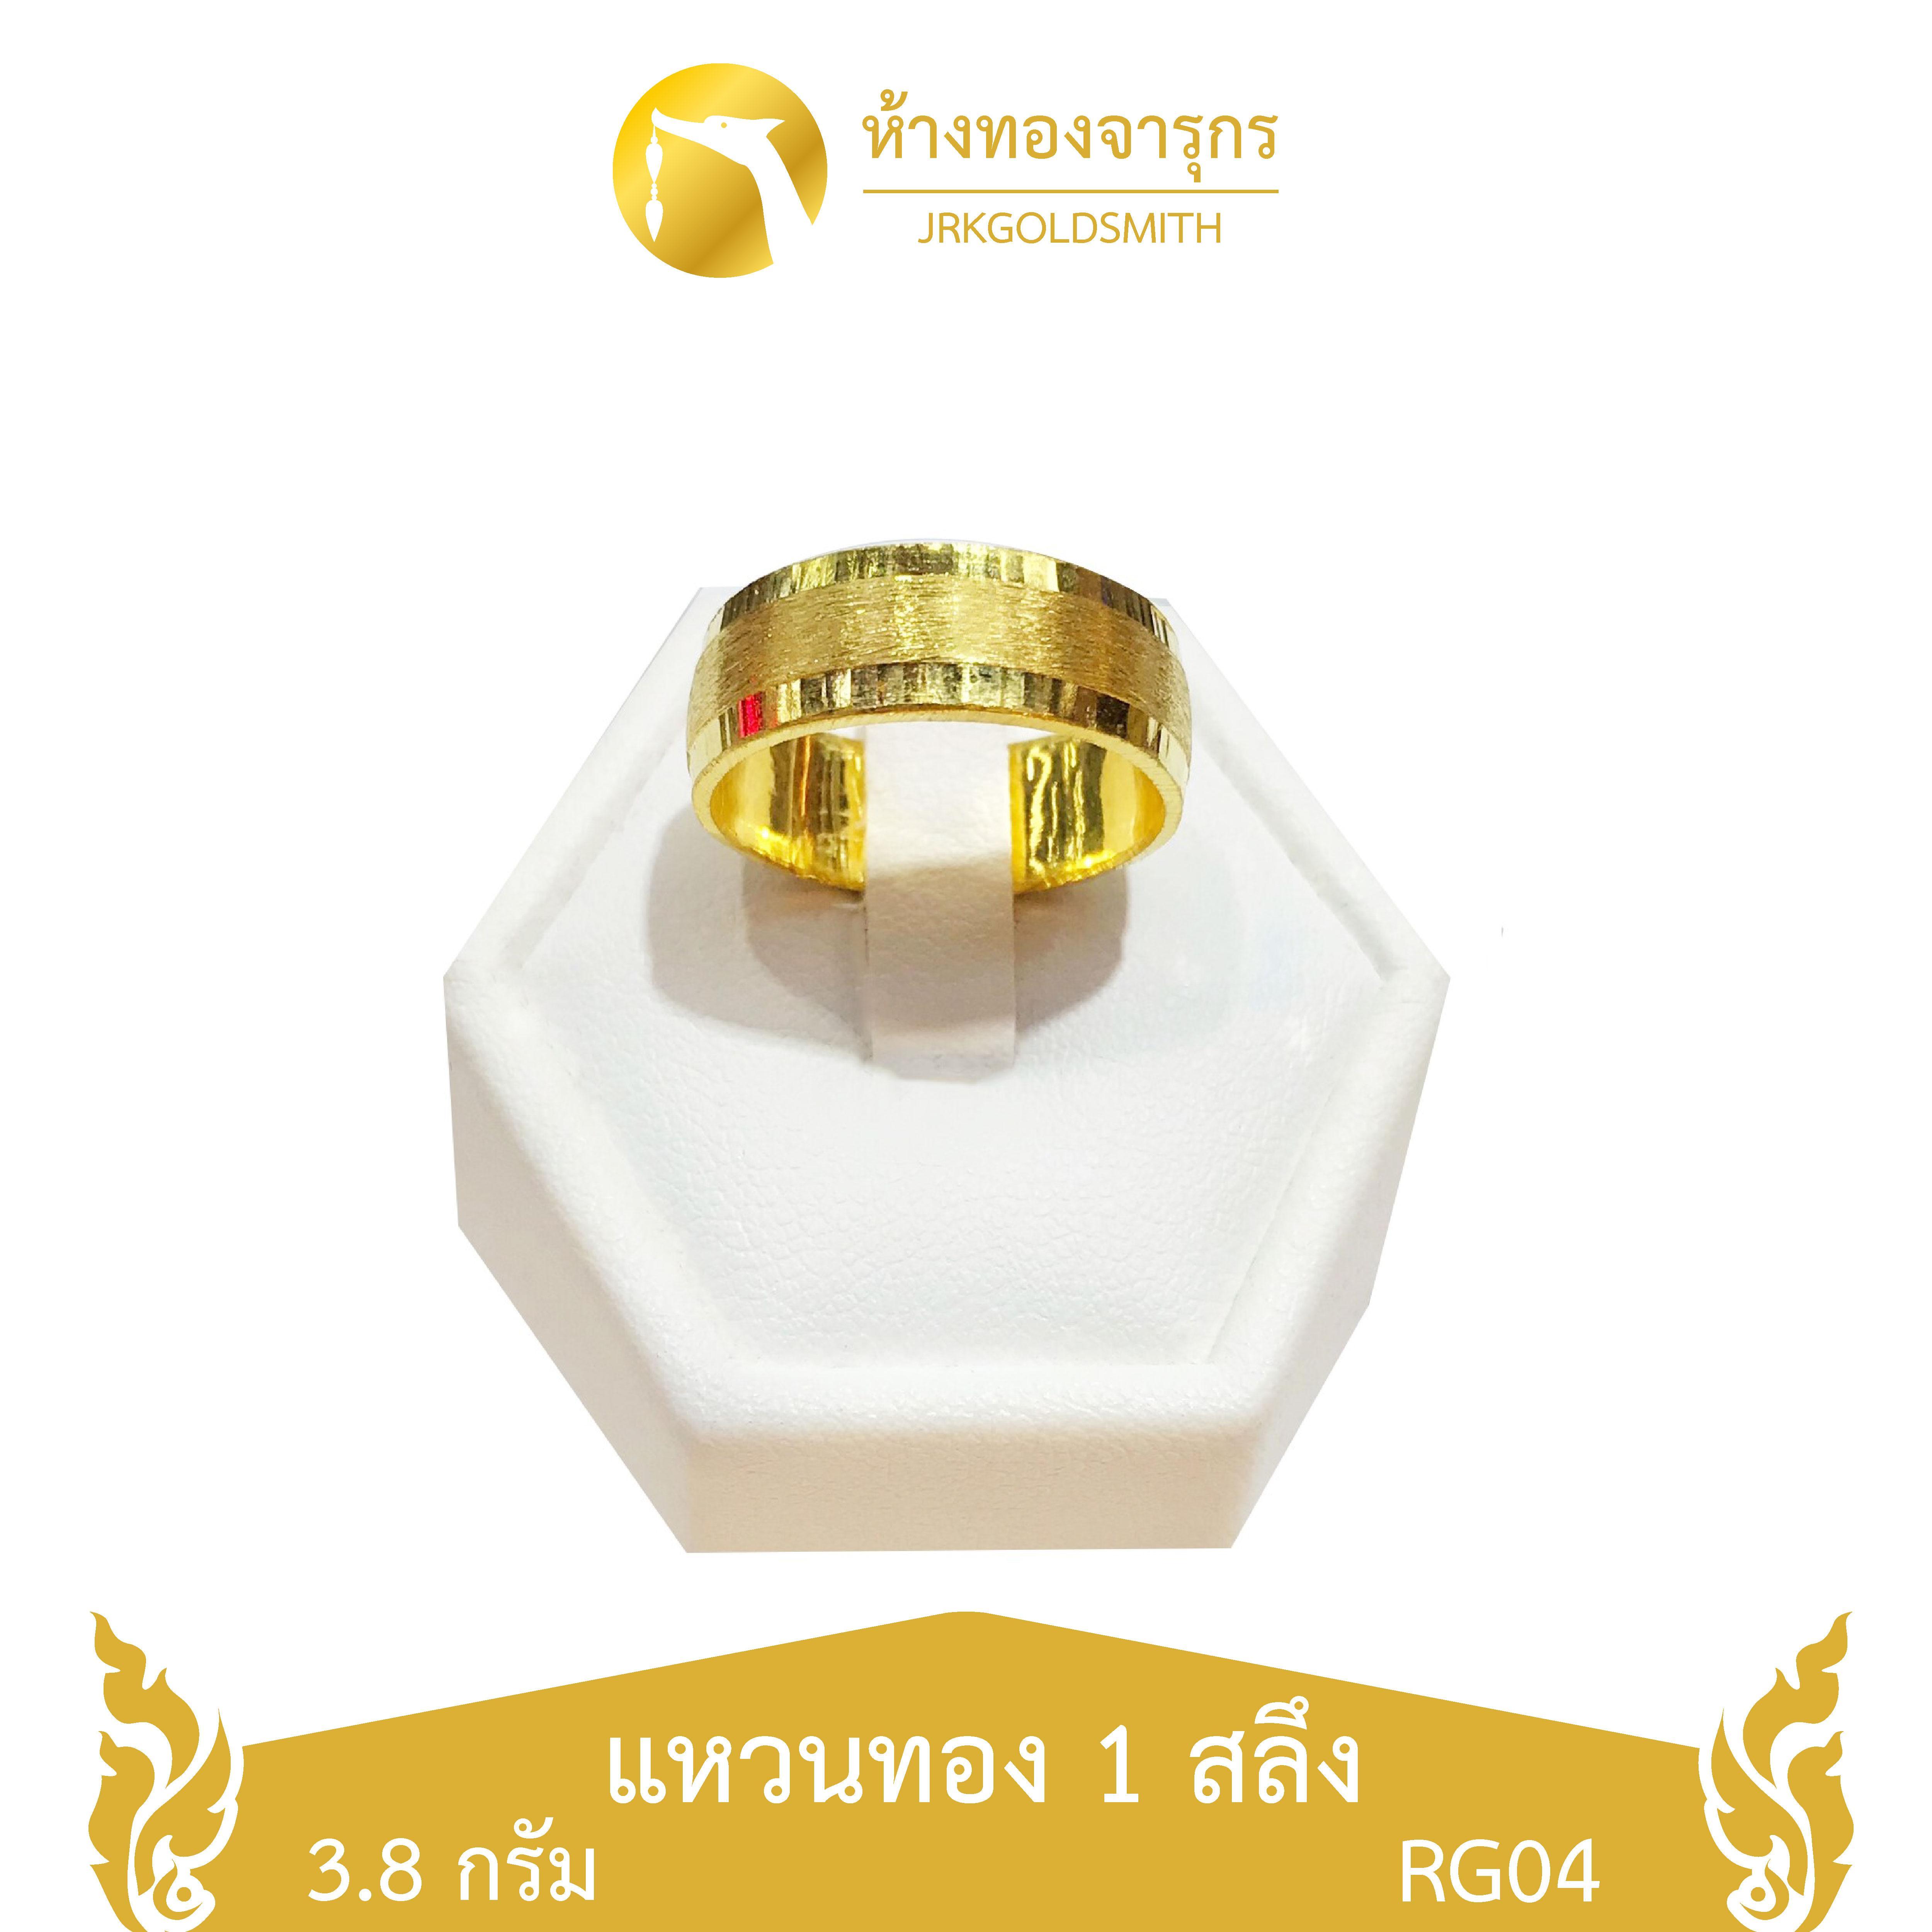 Jrkgold แหวนทองคำแท้ 96.5% ลายเกลี้ยงพ่นทราย น้ำหนัก 1 สลึง ขายได้ จำนำได้ ส่งฟรี พร้อมใบรับประกัน ทองดีมีคุณภาพ (แหวนแฟชั่น,แหวนทองแท้,แหวนผู้ชาย,แหวนผู้หญิง).